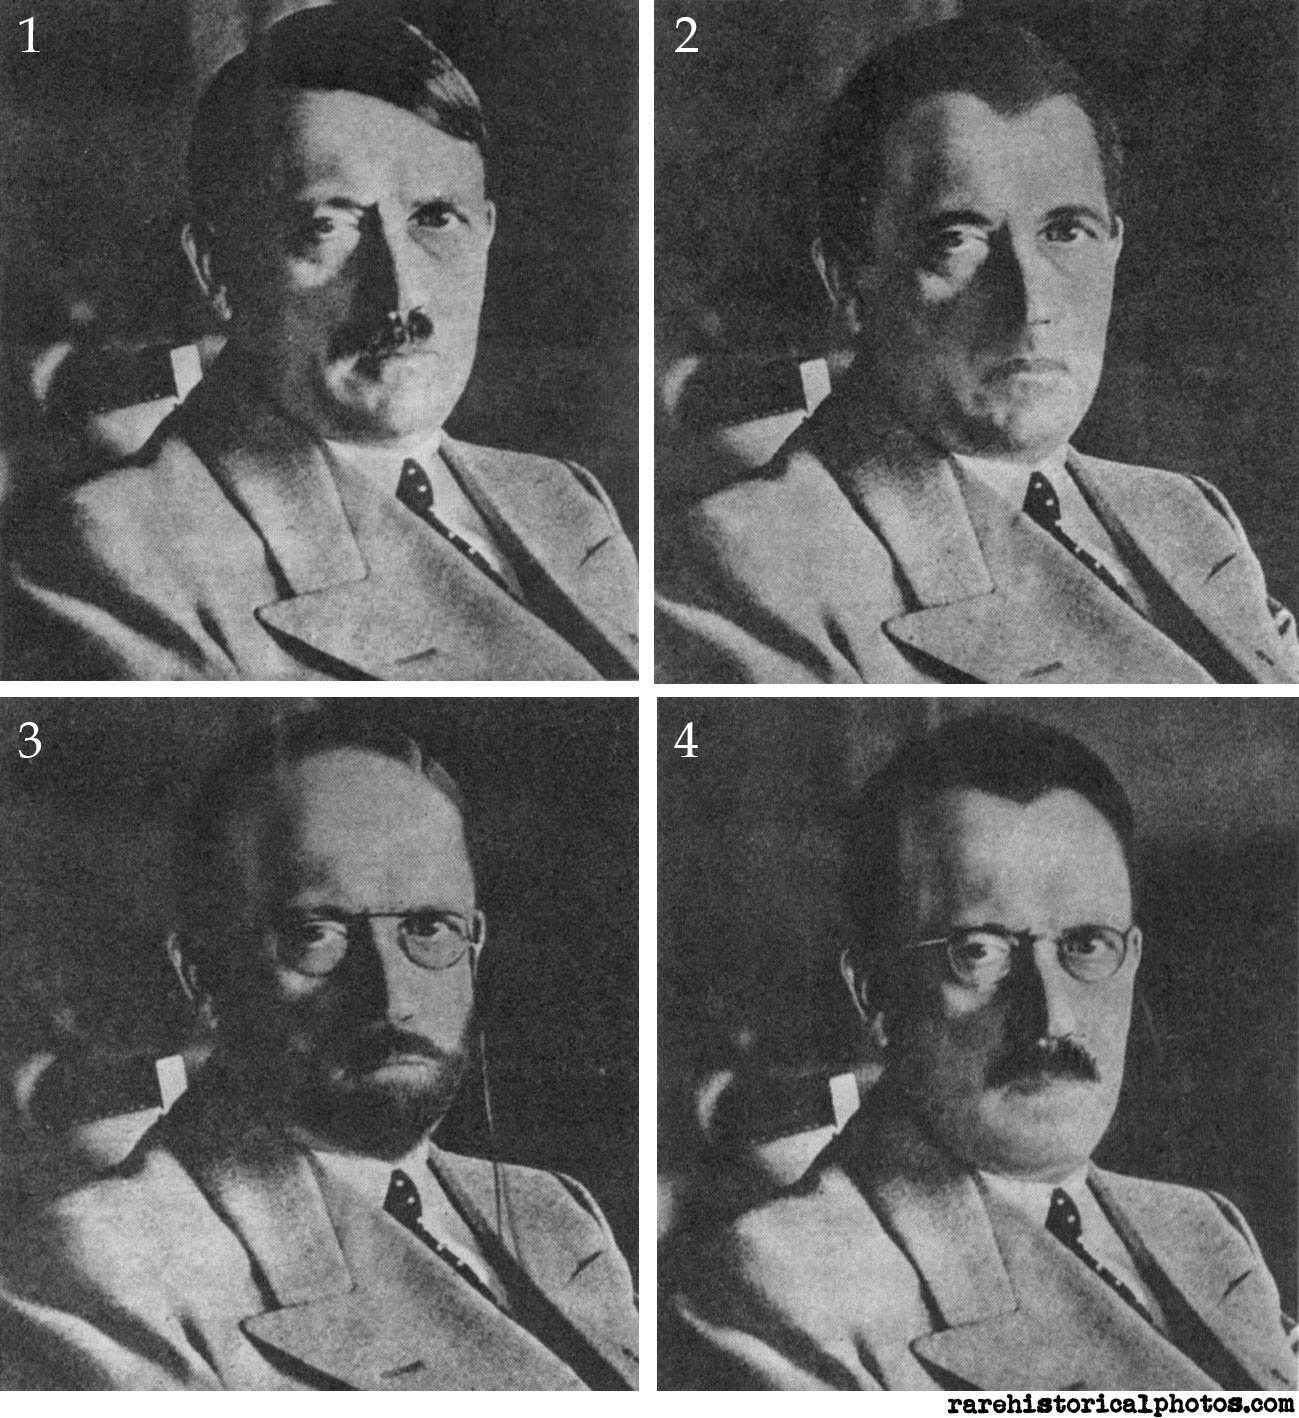 1-4 mockups of Hitler.